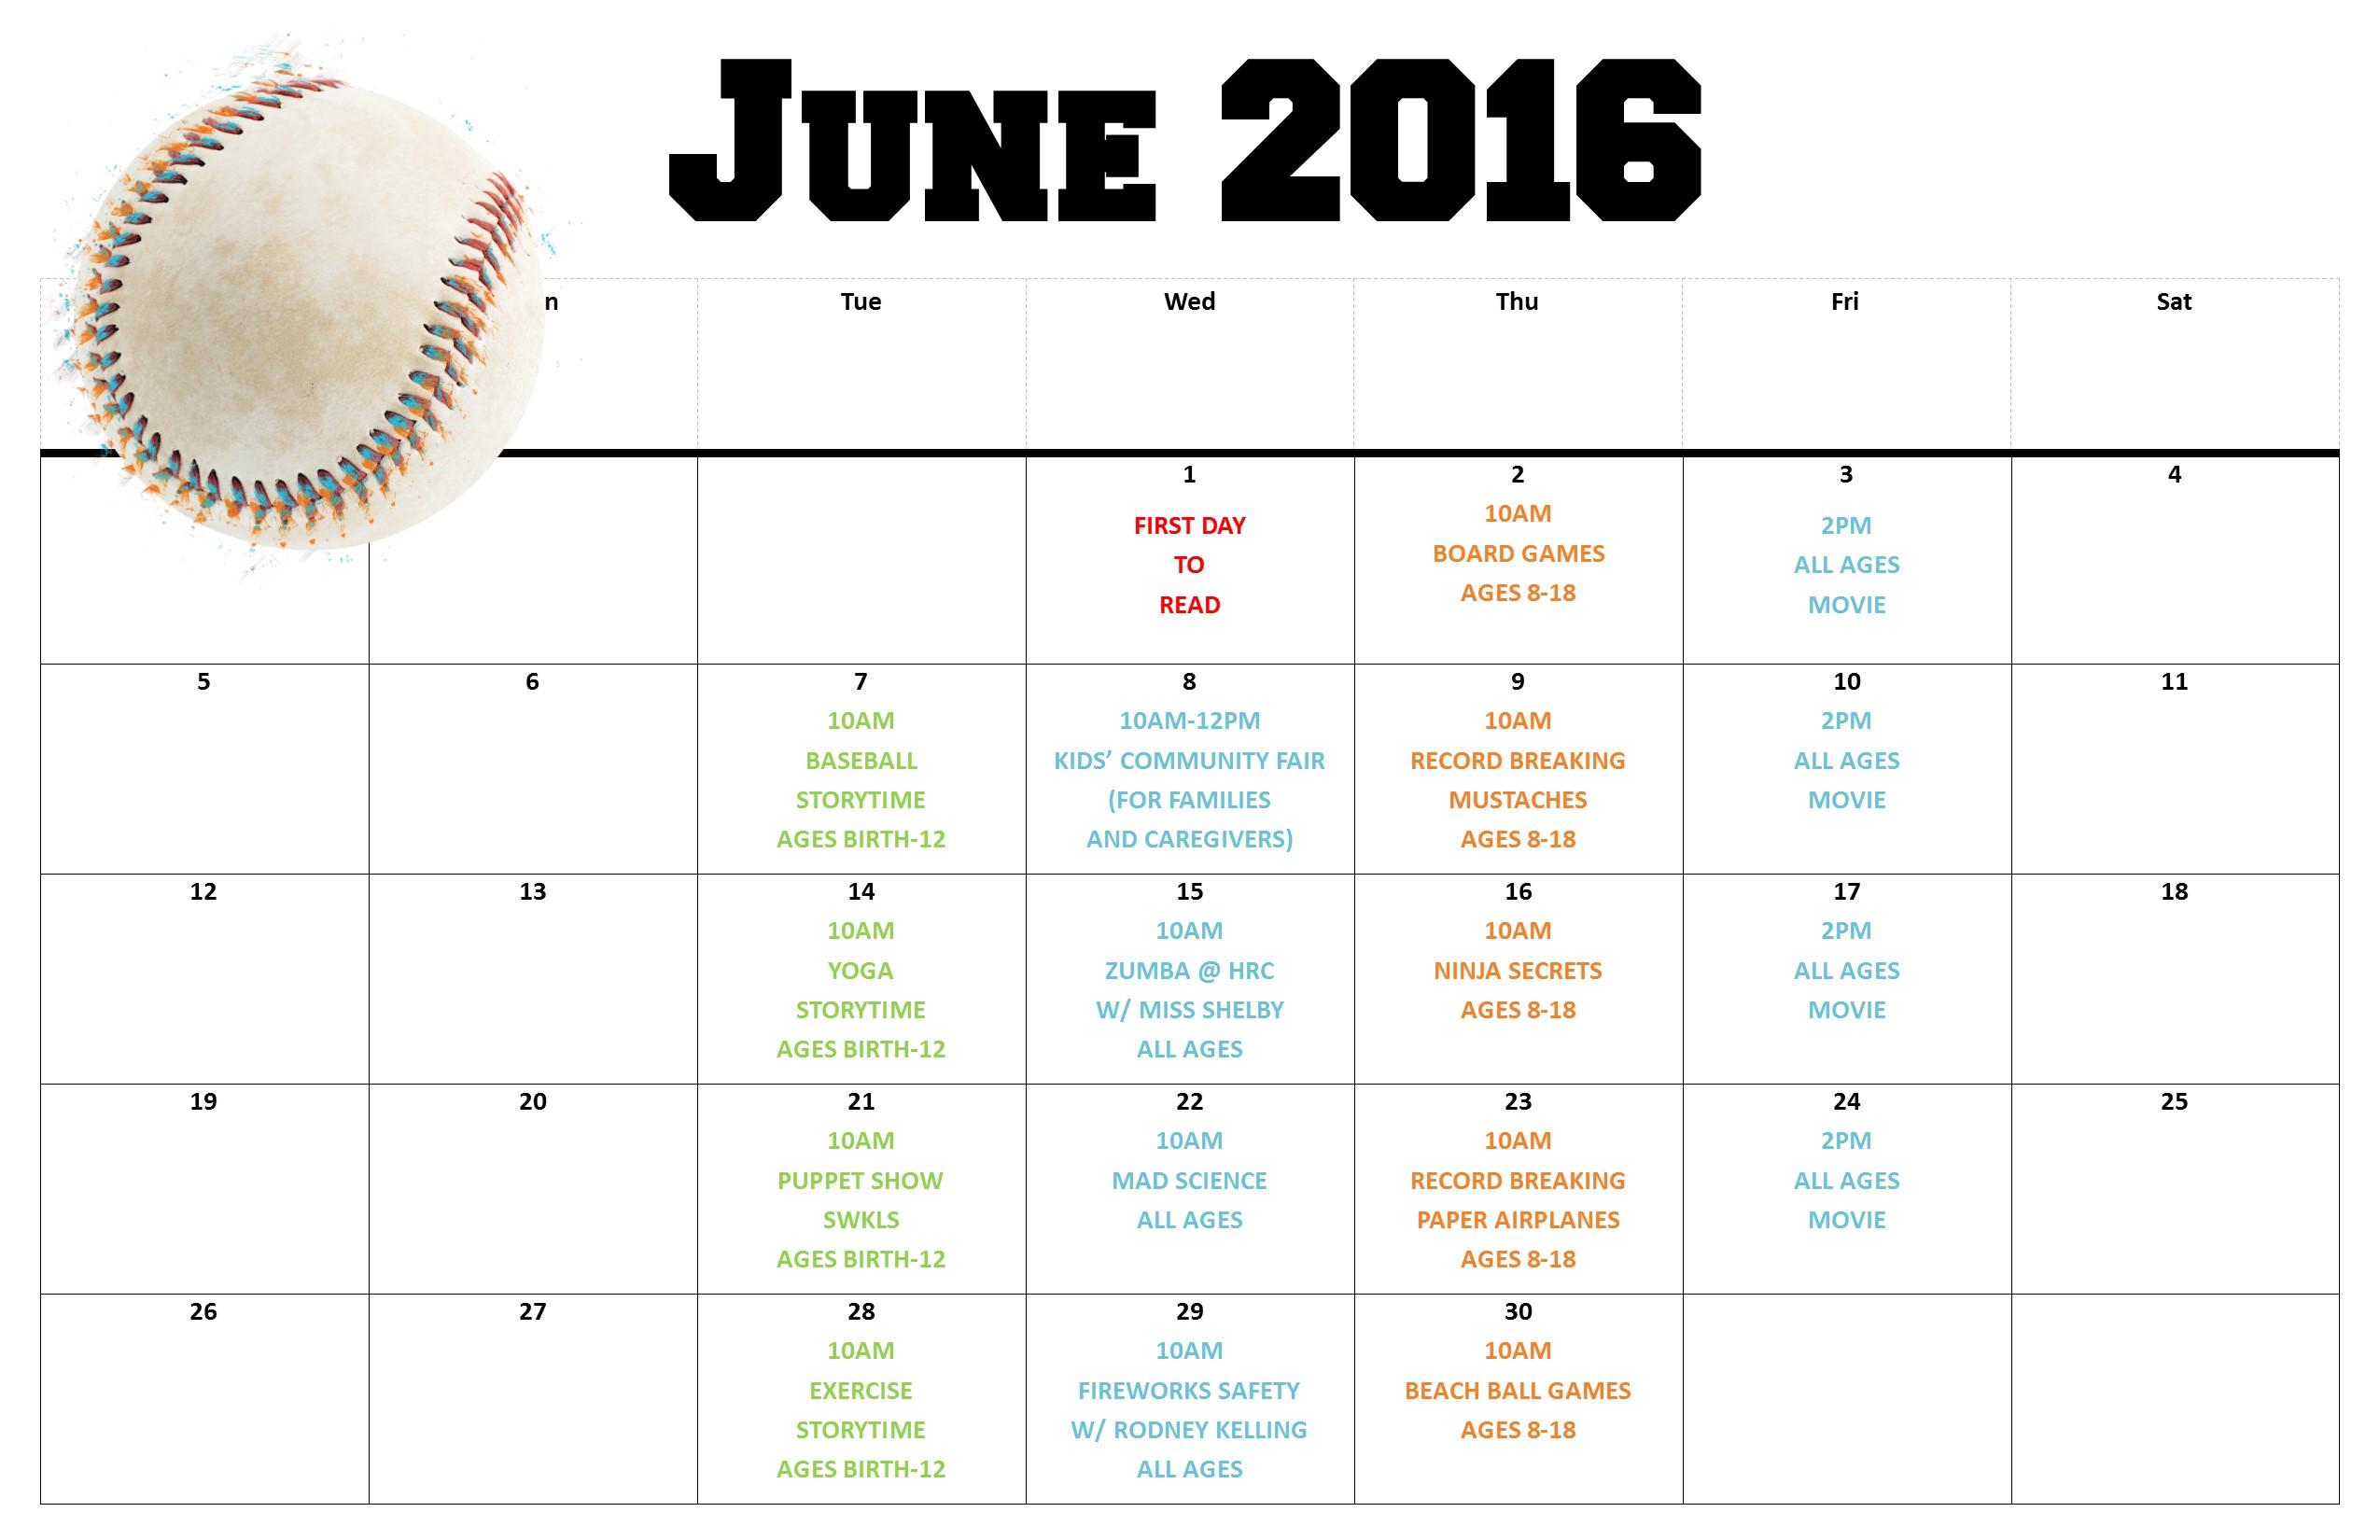 CALENDAR OF EVENTS - JUNE 2016